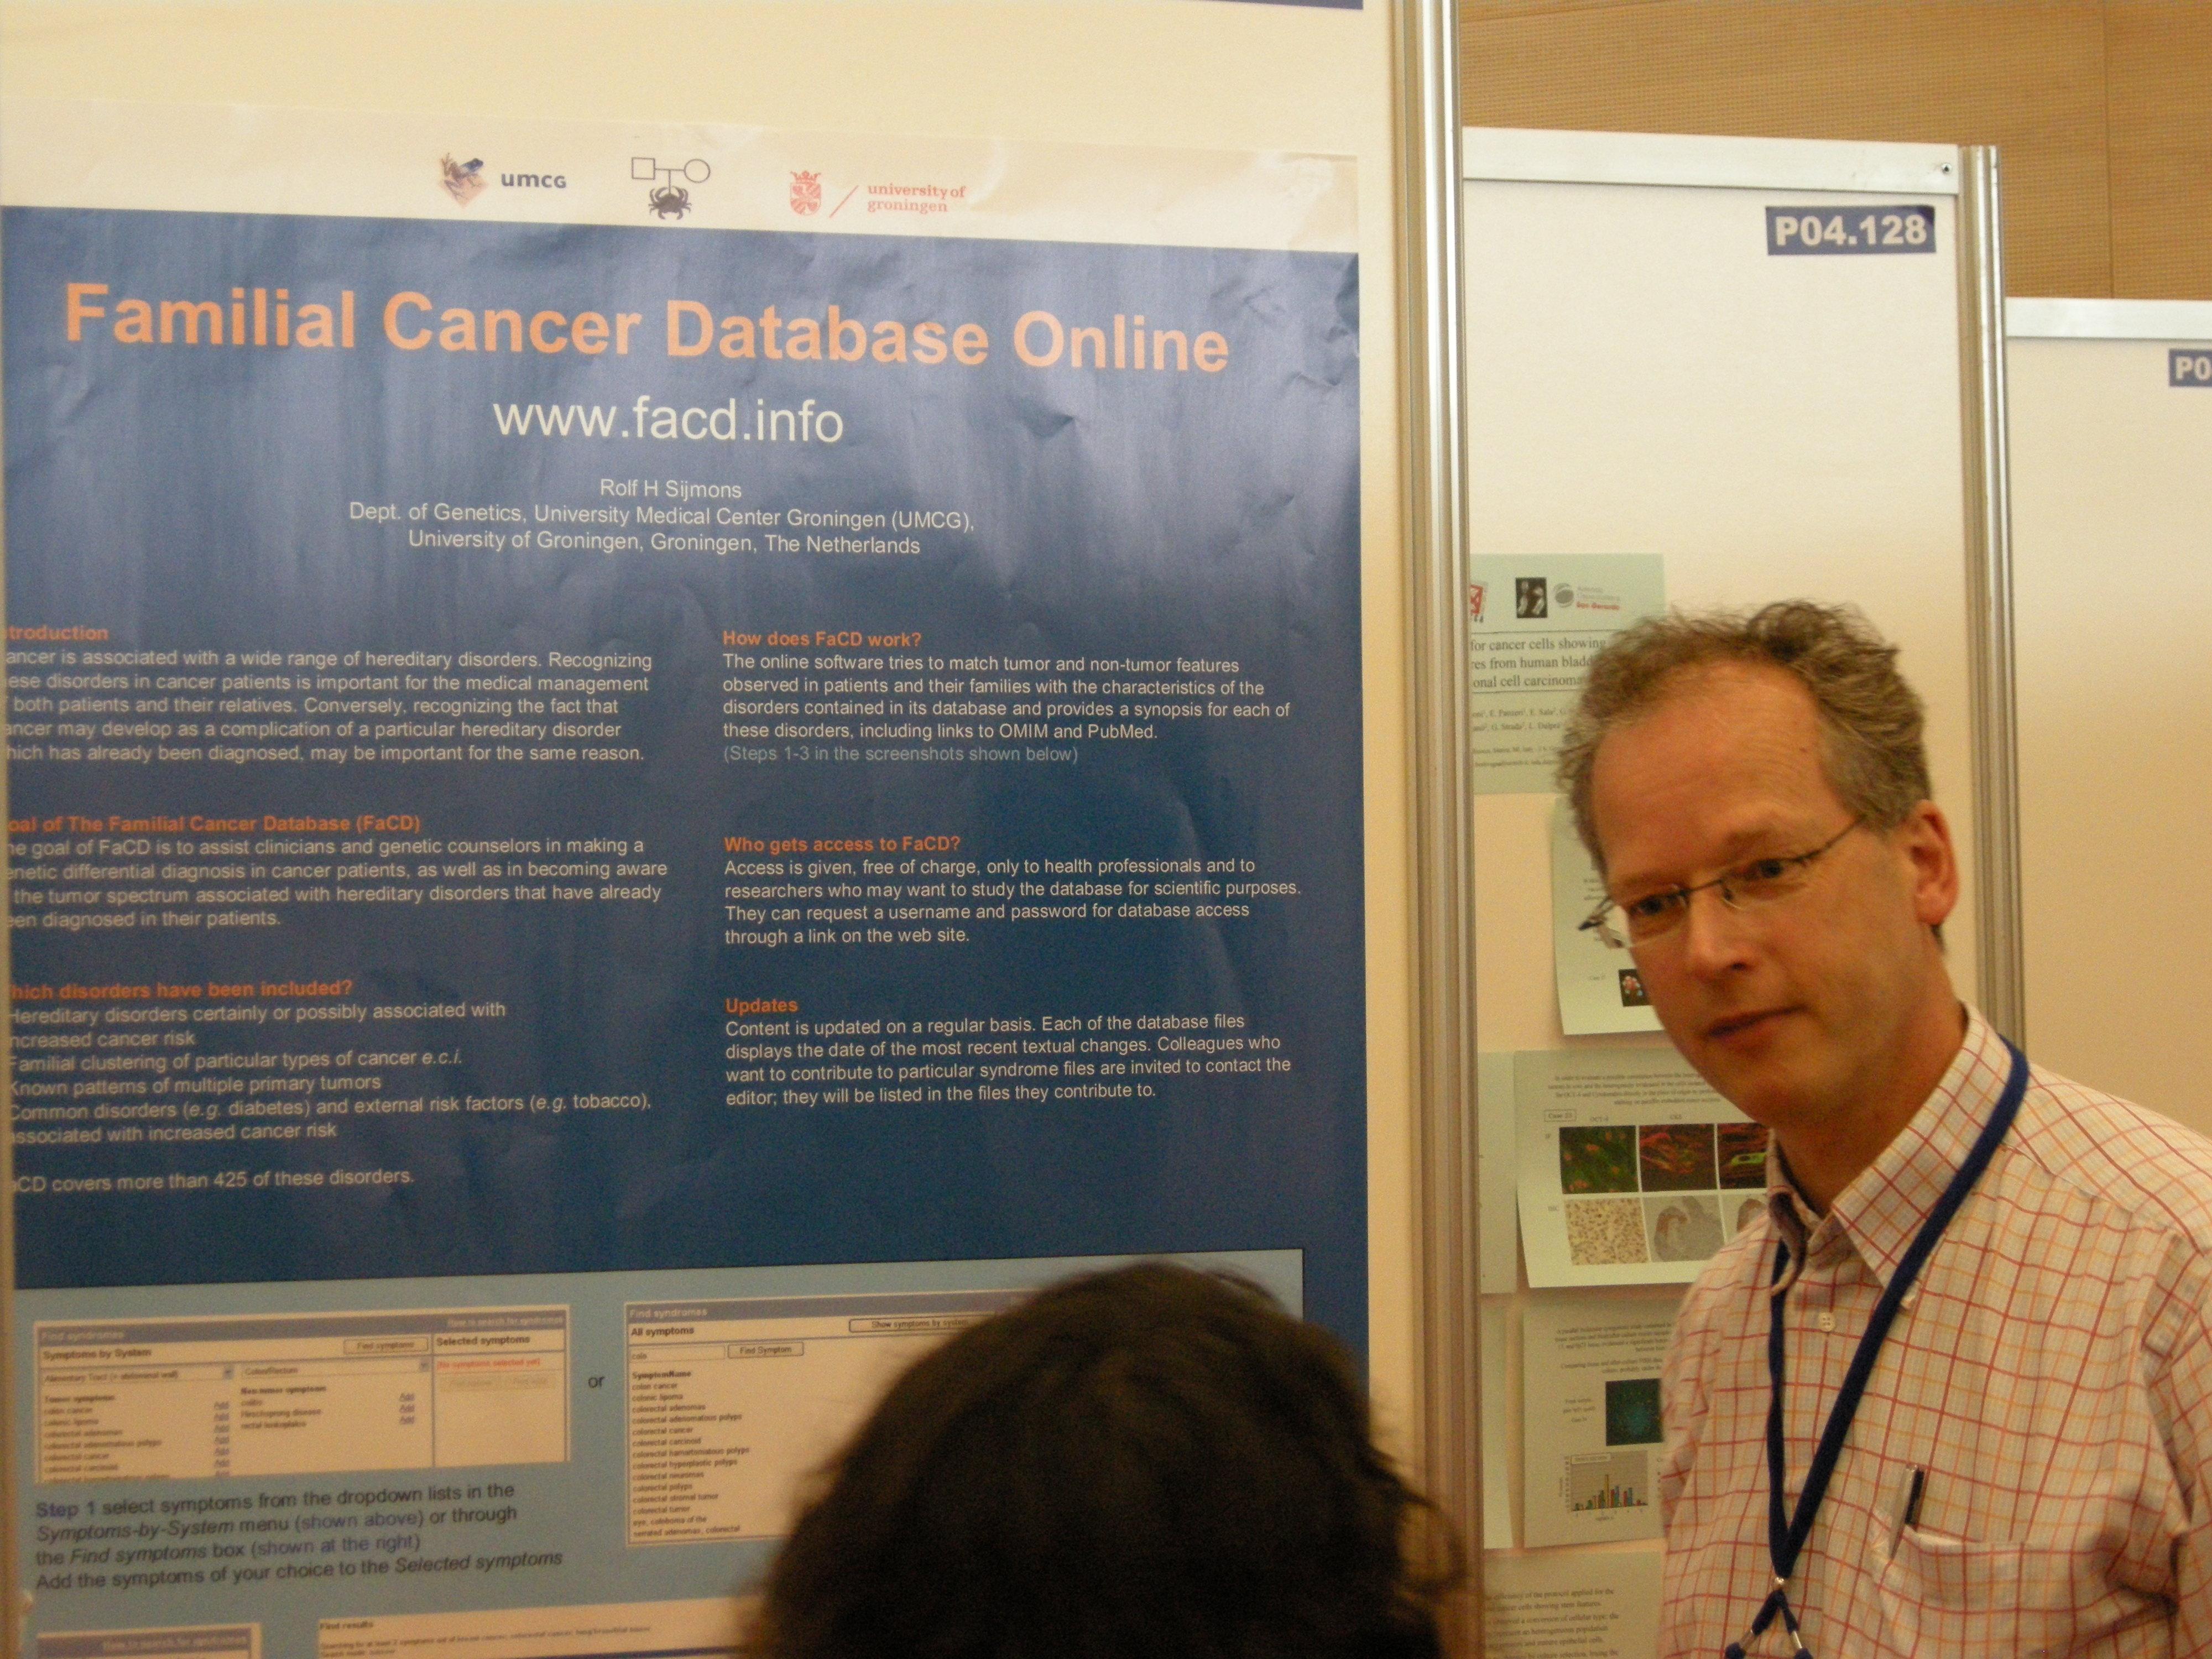 familial cancer database